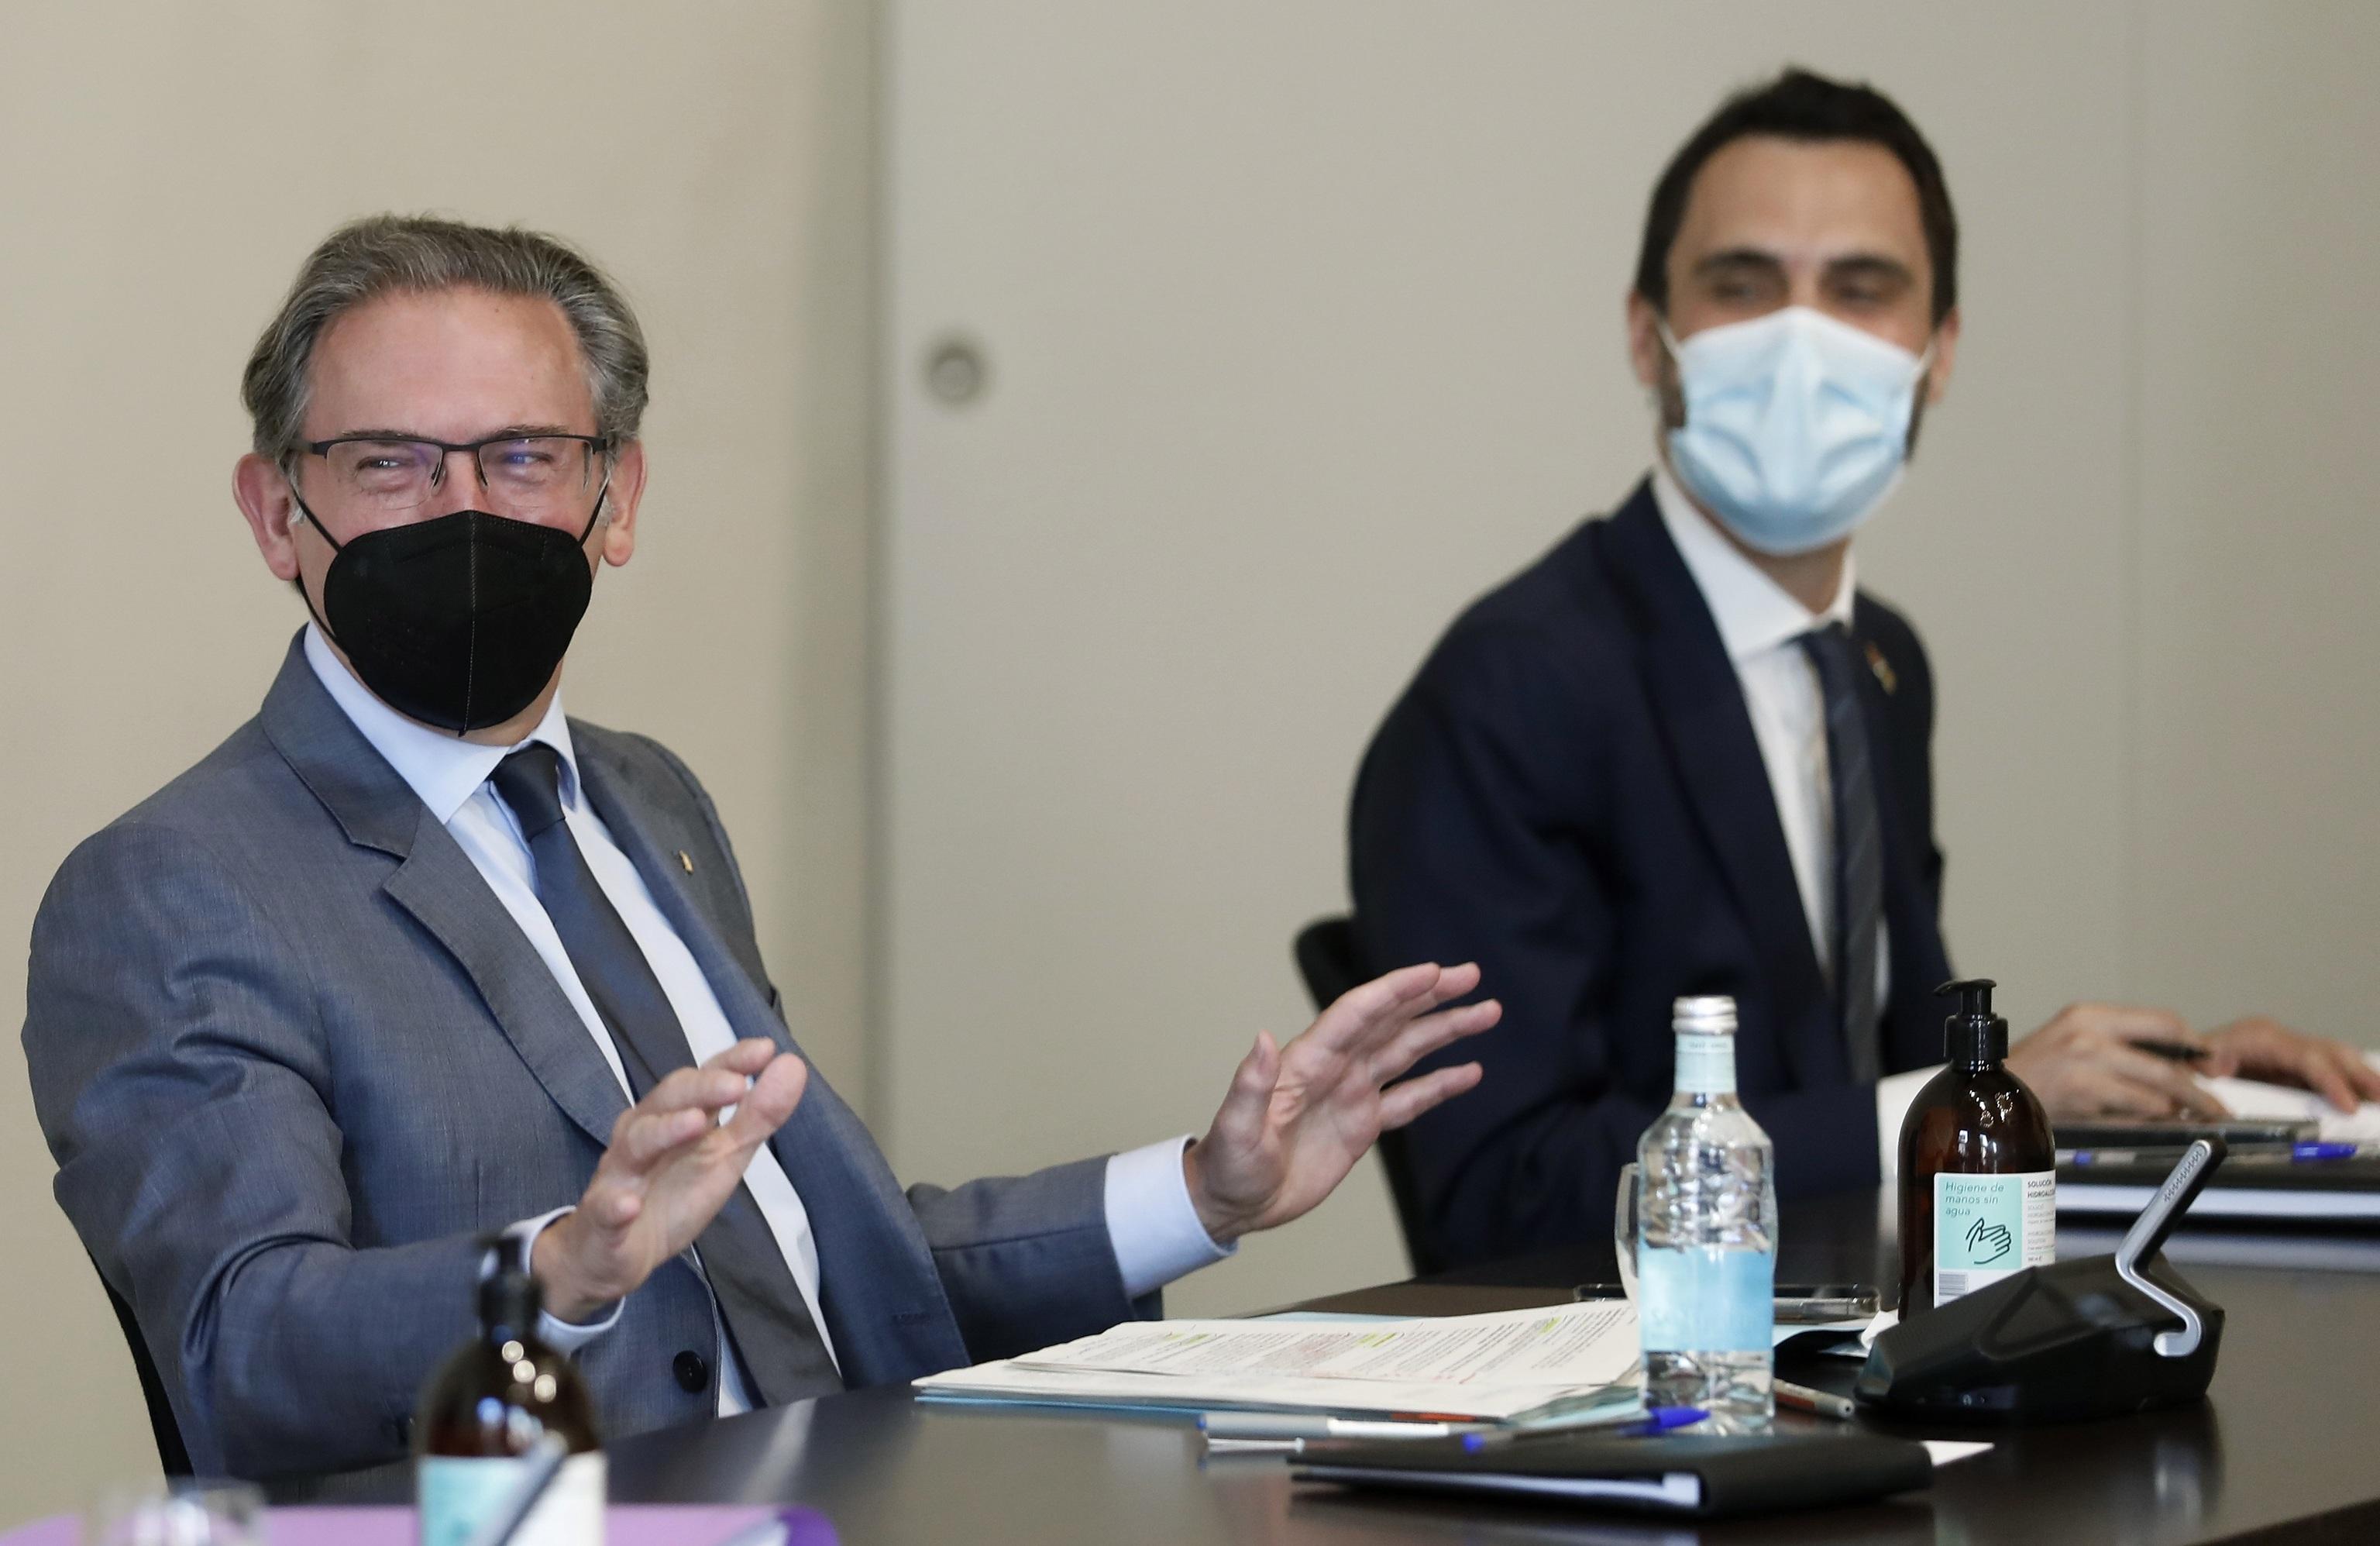 Los consejeros Jaume Giró y Roger Torrent.